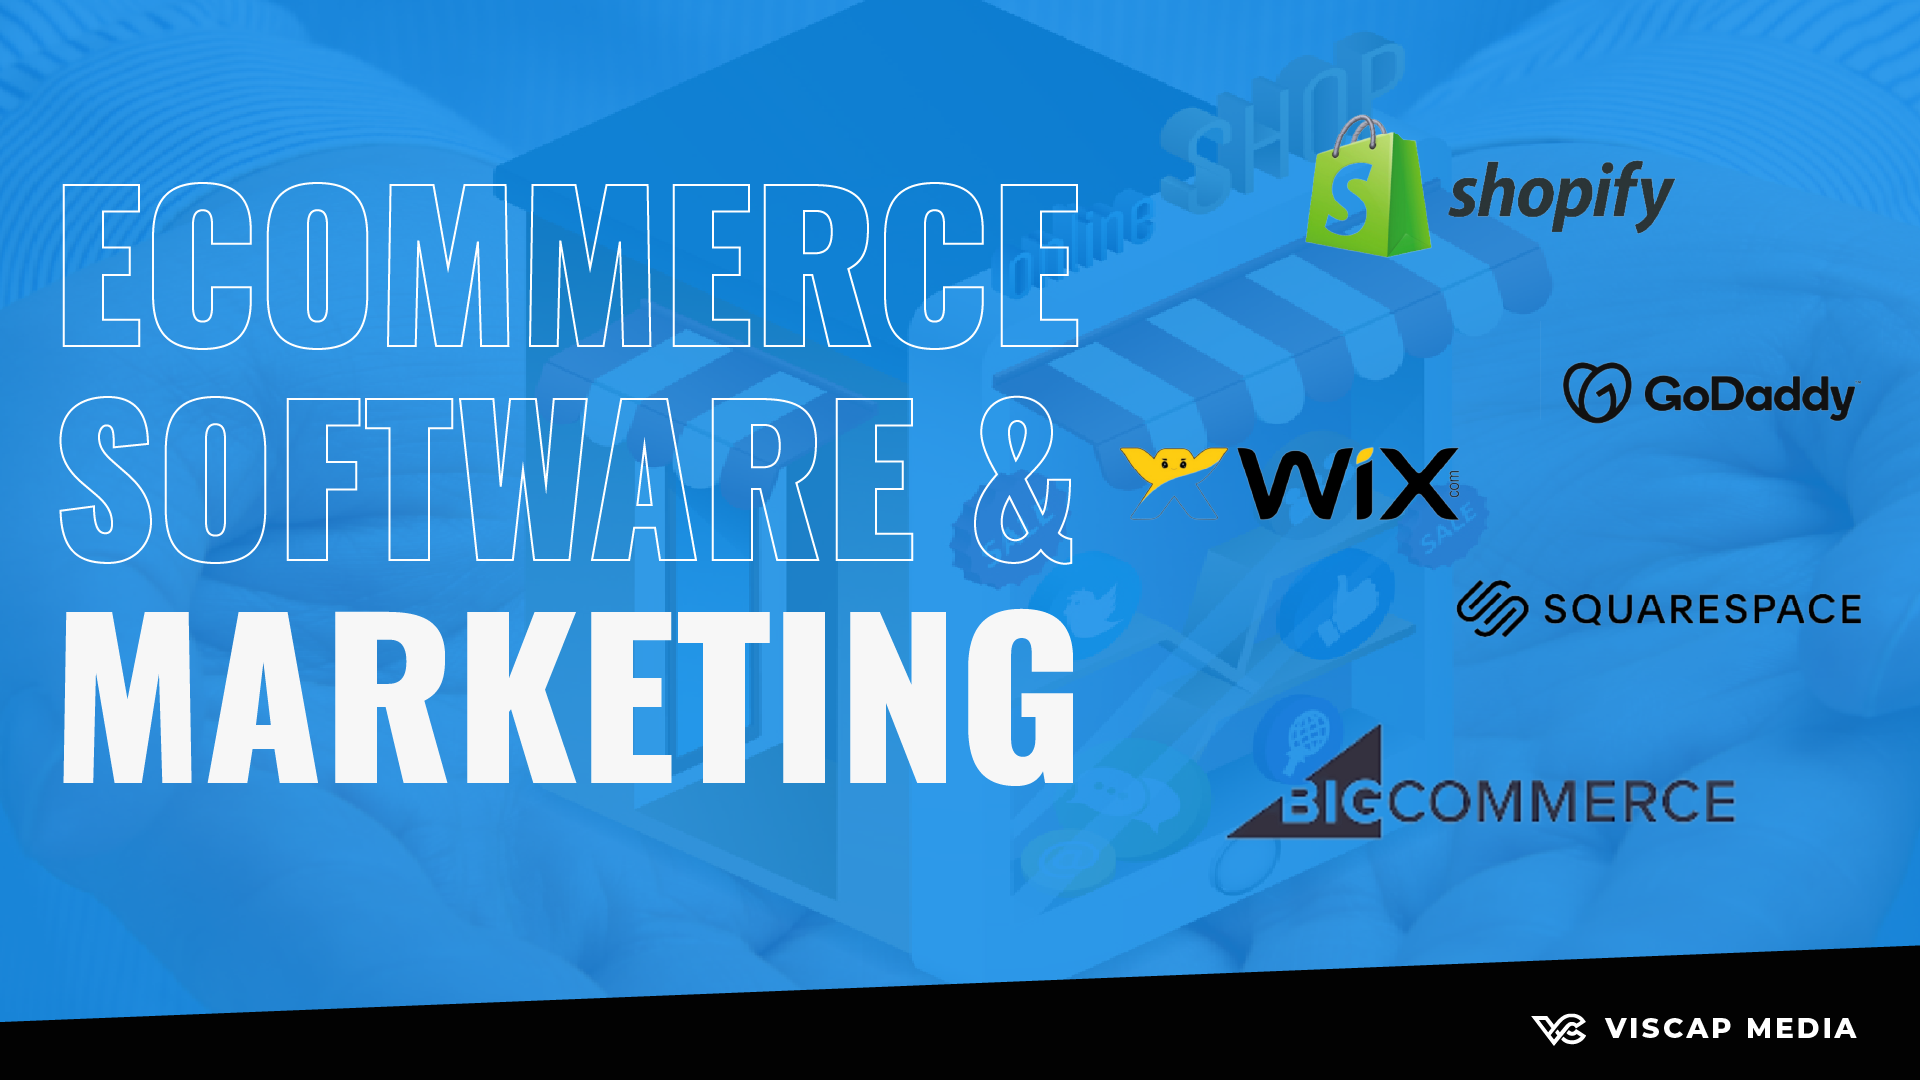 eCommerce Software & Marketing Article Thumbnail